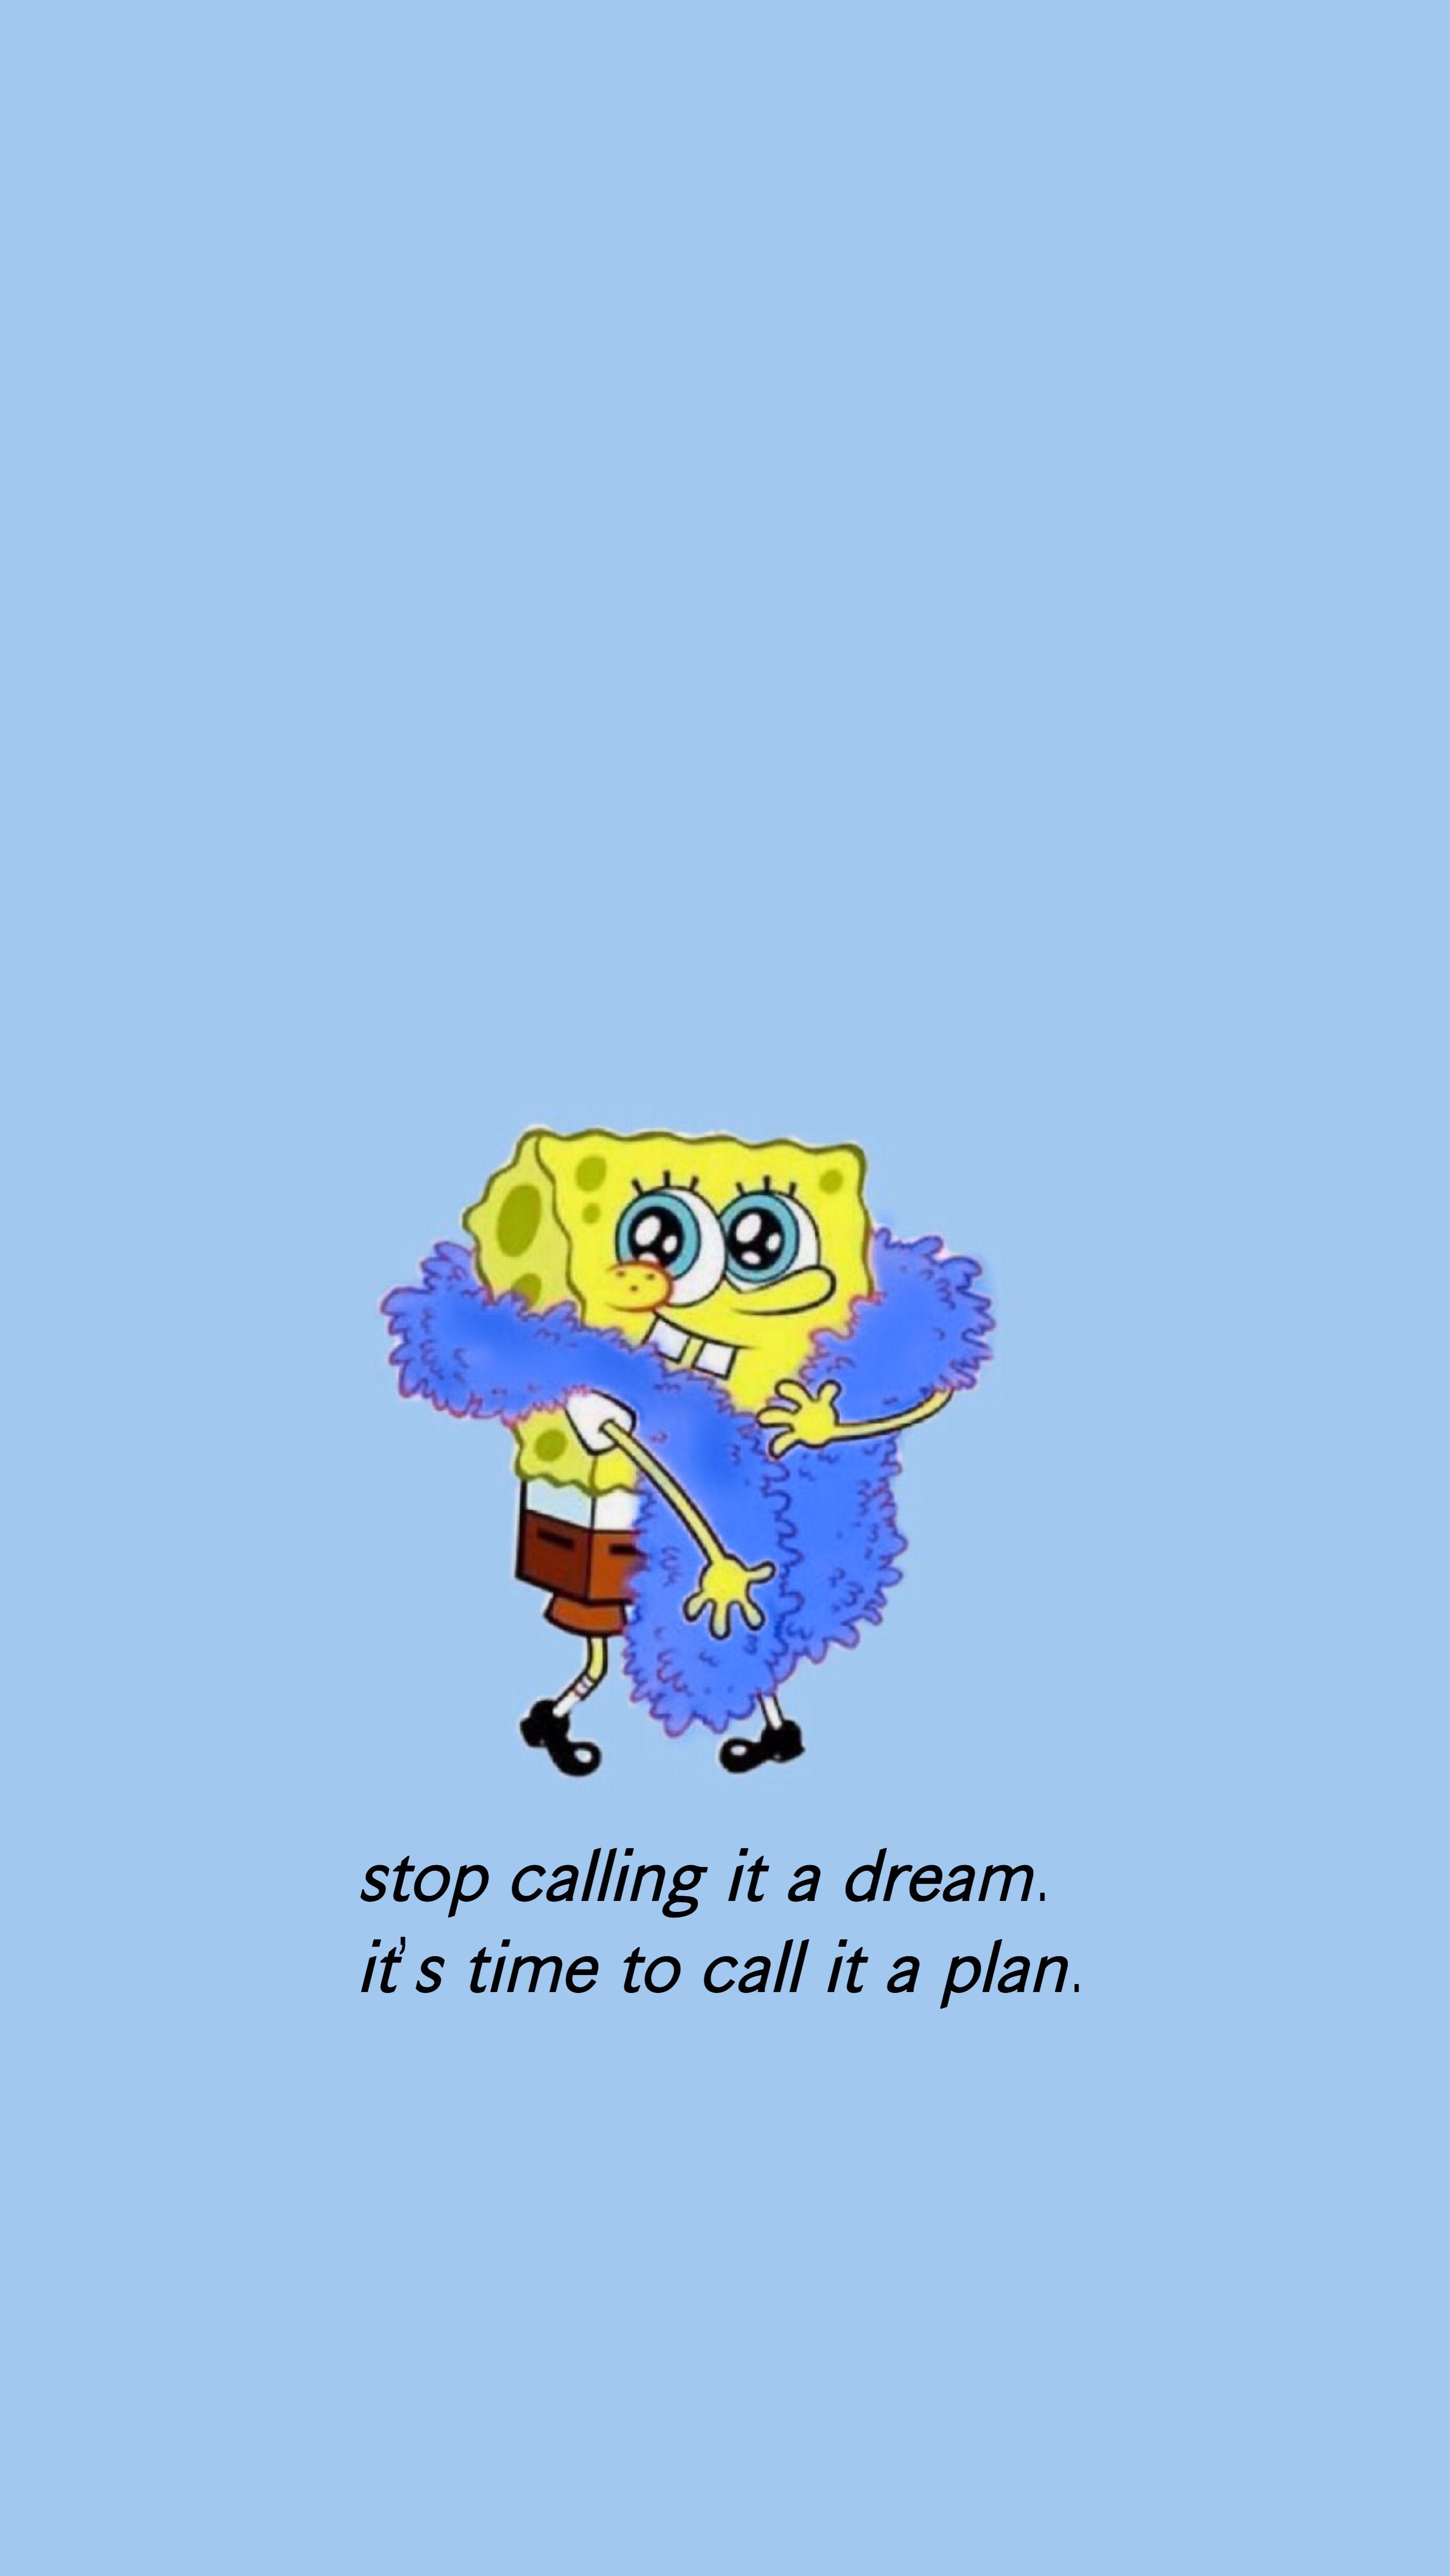 Cute Iphone Spongebob 3072x5457 Wallpaper Teahub Io